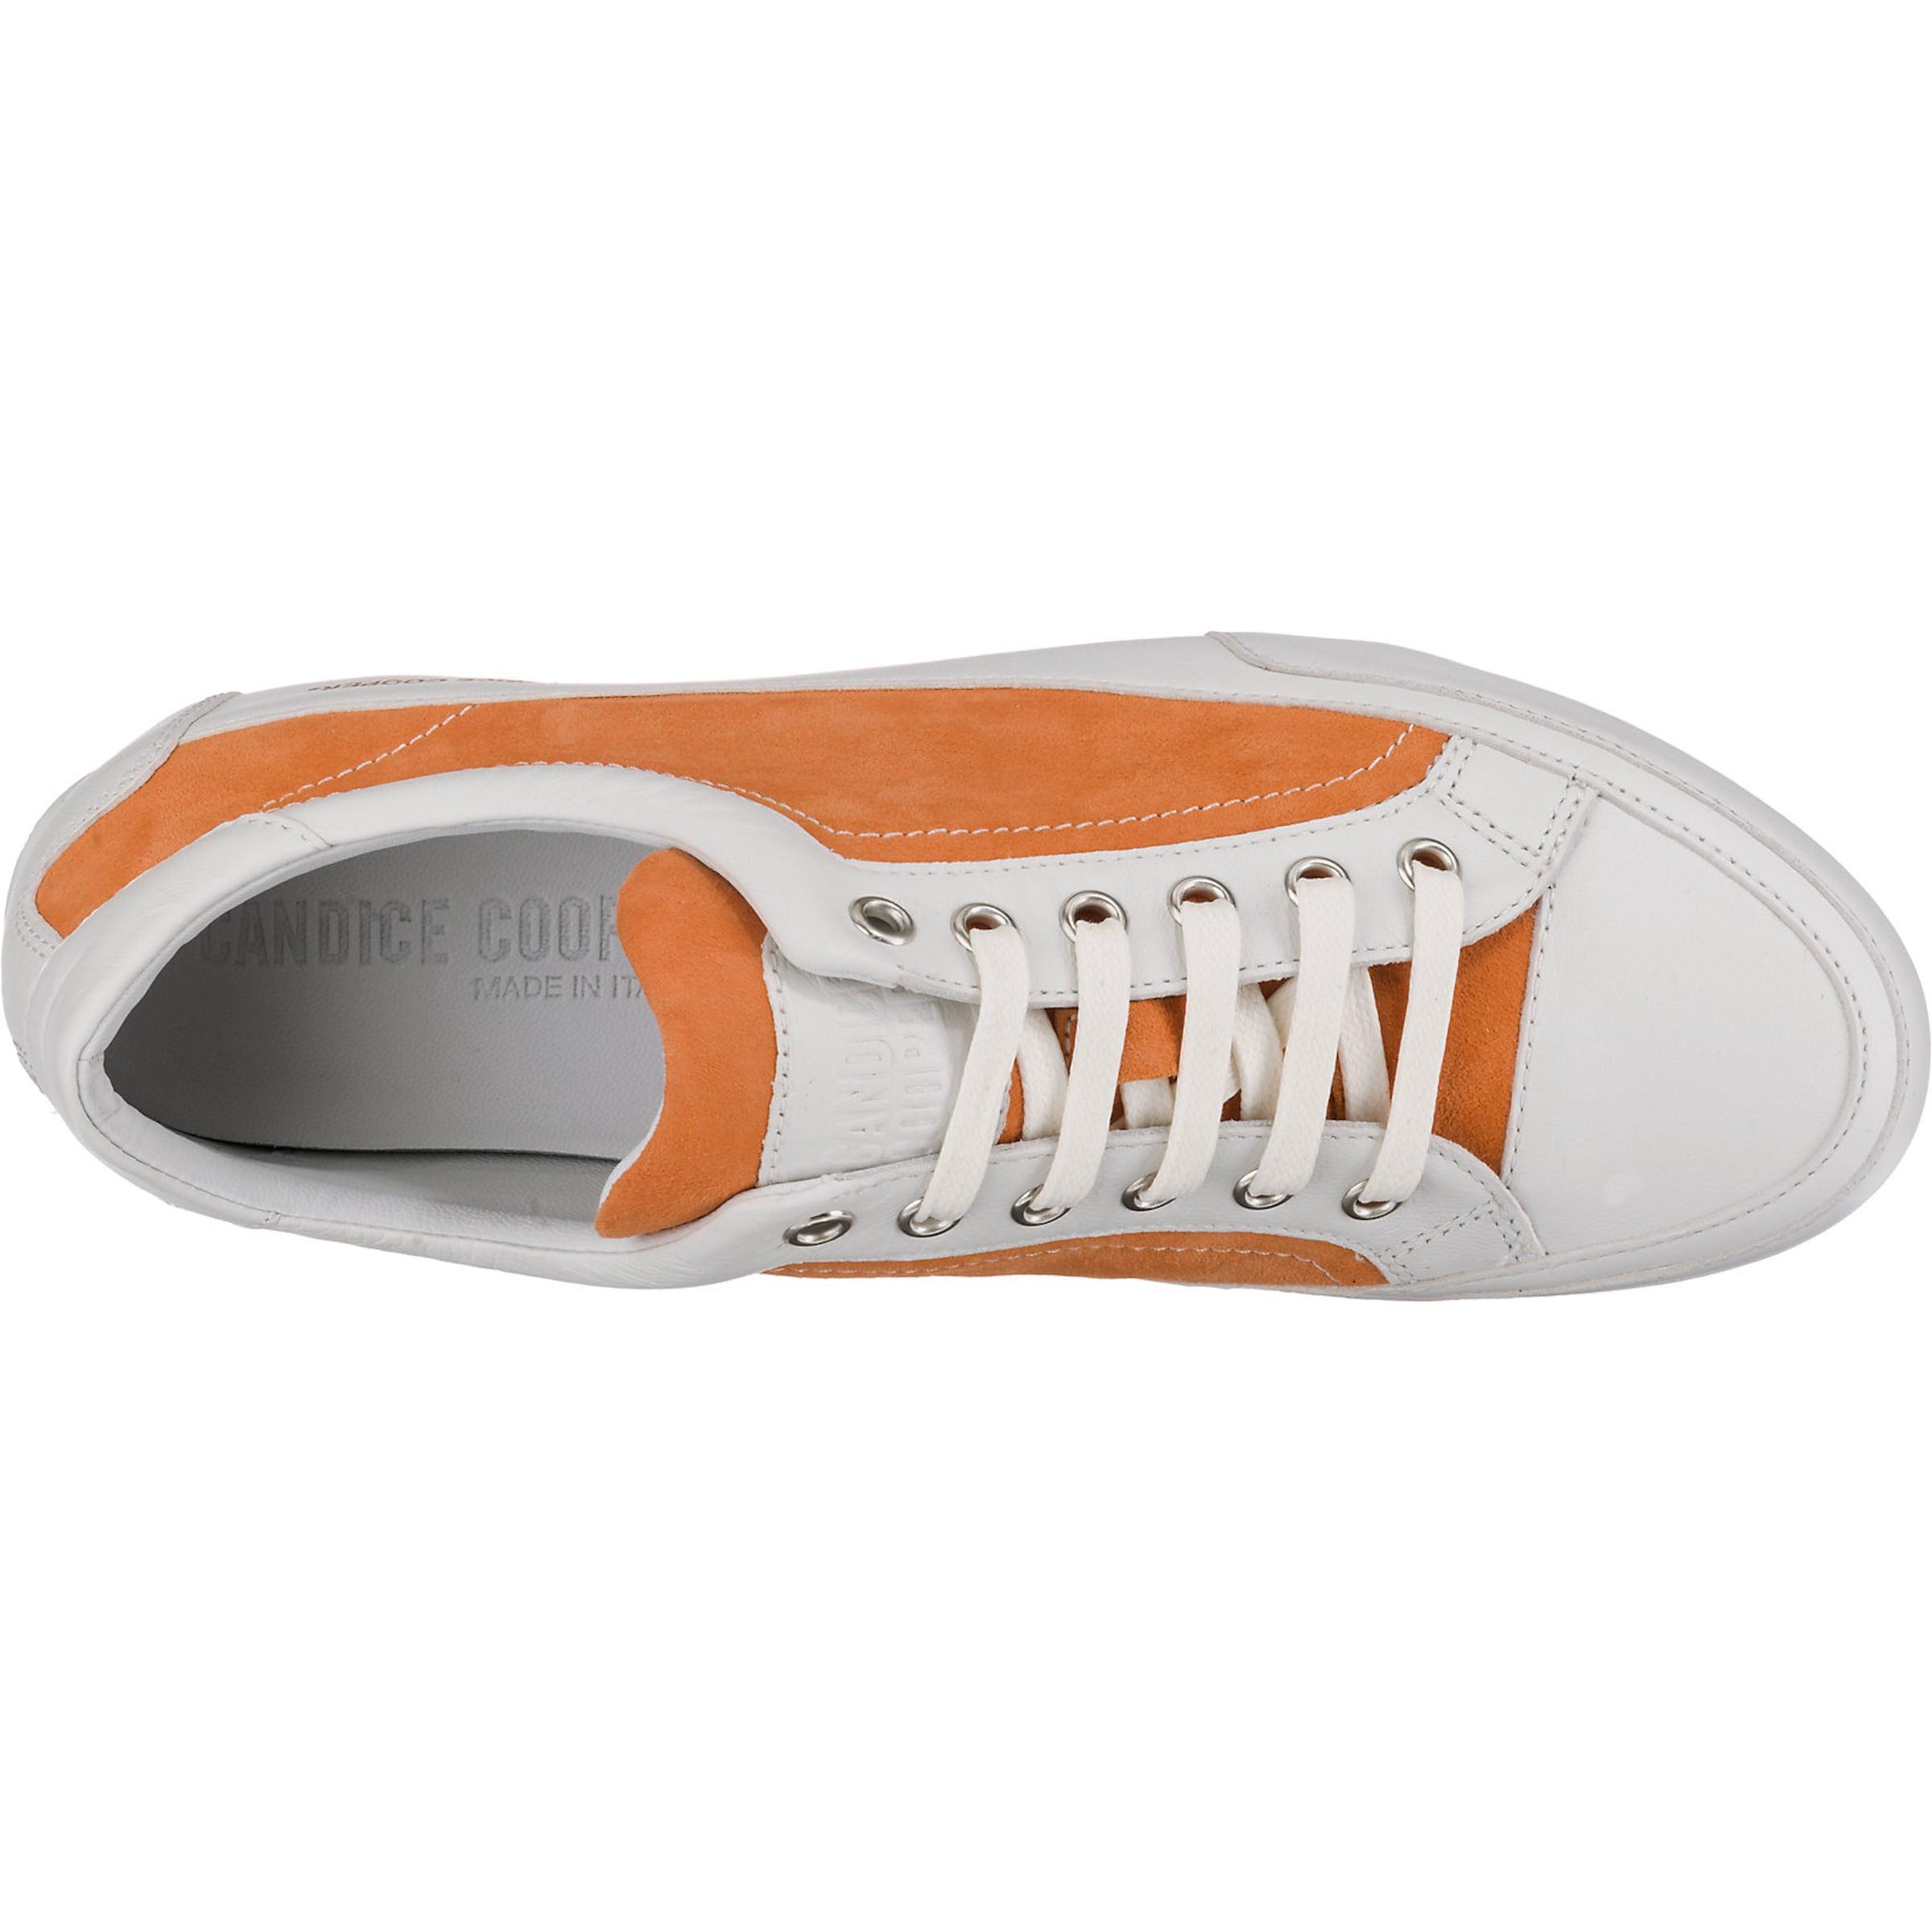 Sneakers Candice Low OrangeWeiß In Cooper PZTXuOki